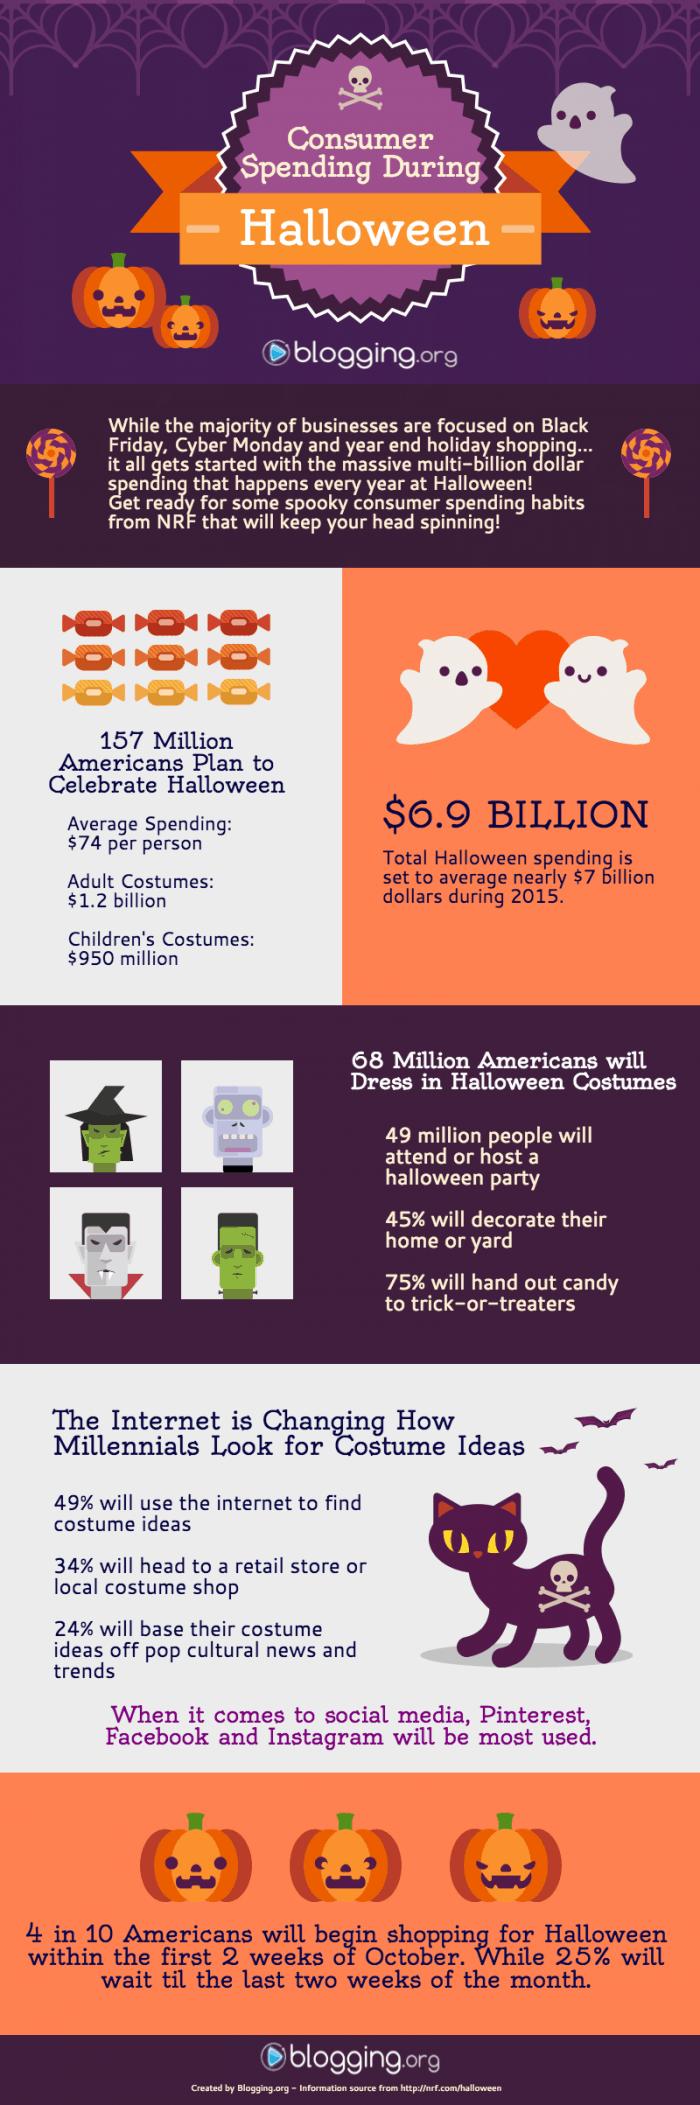 Consumer Spending During Halloween Infographic